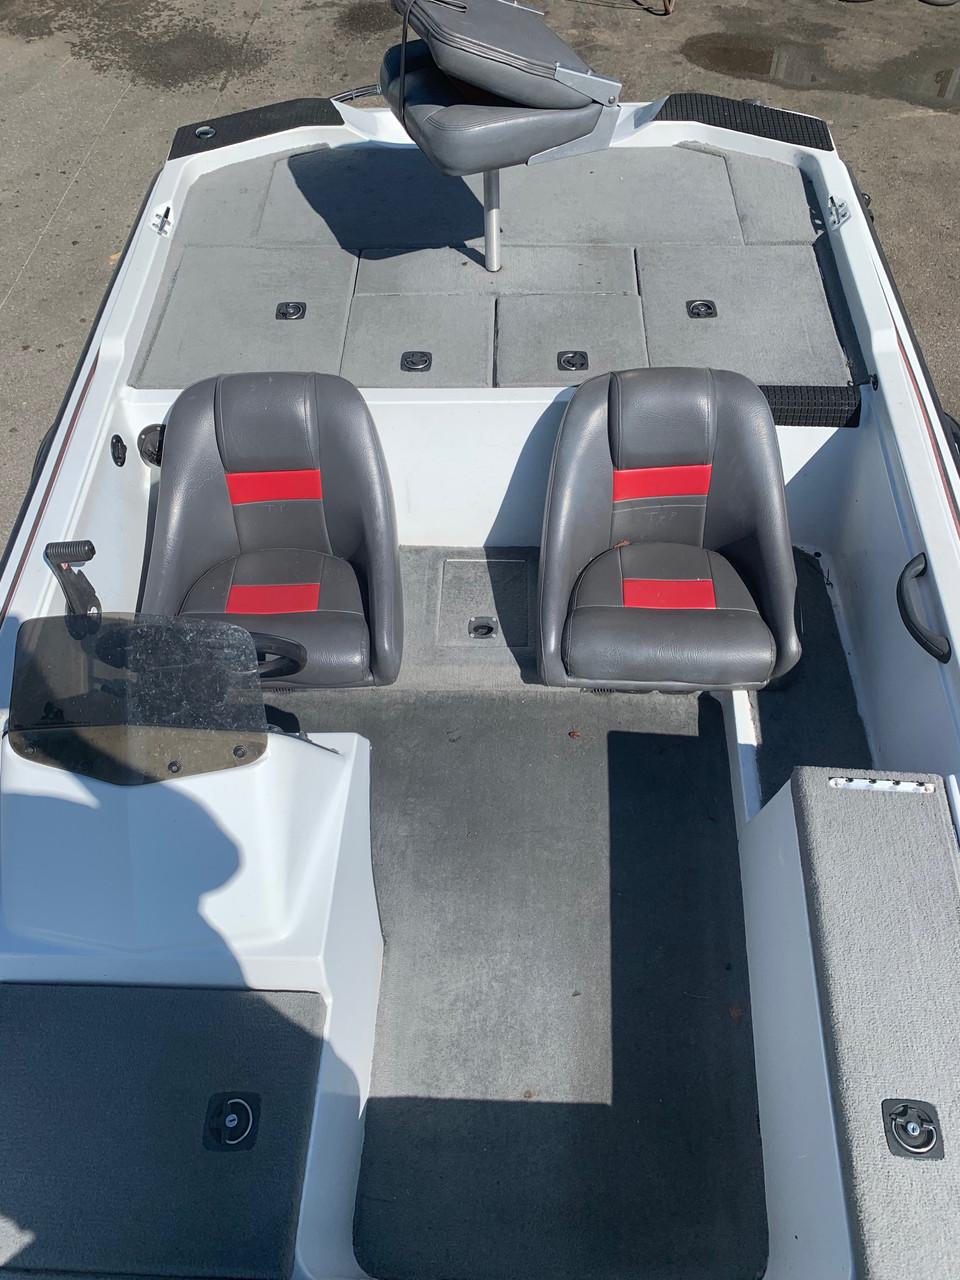 2003 Aries 181 18' Fiberglass Bass Boat with Trailer